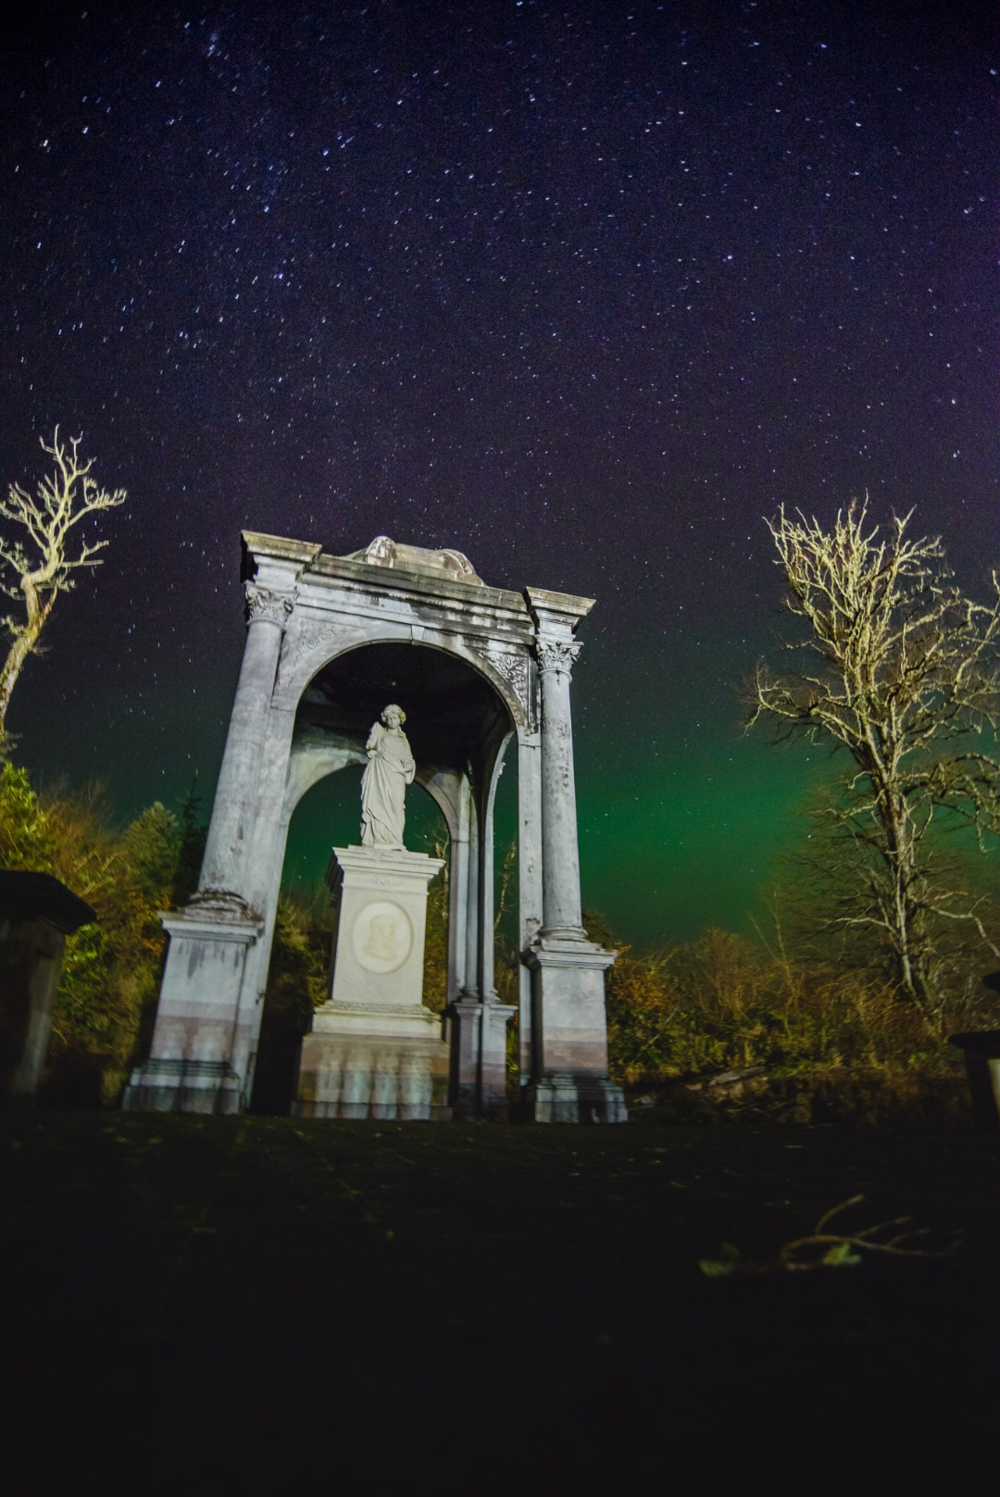 Aurora over Lady Matheson's Statue, Stornoway